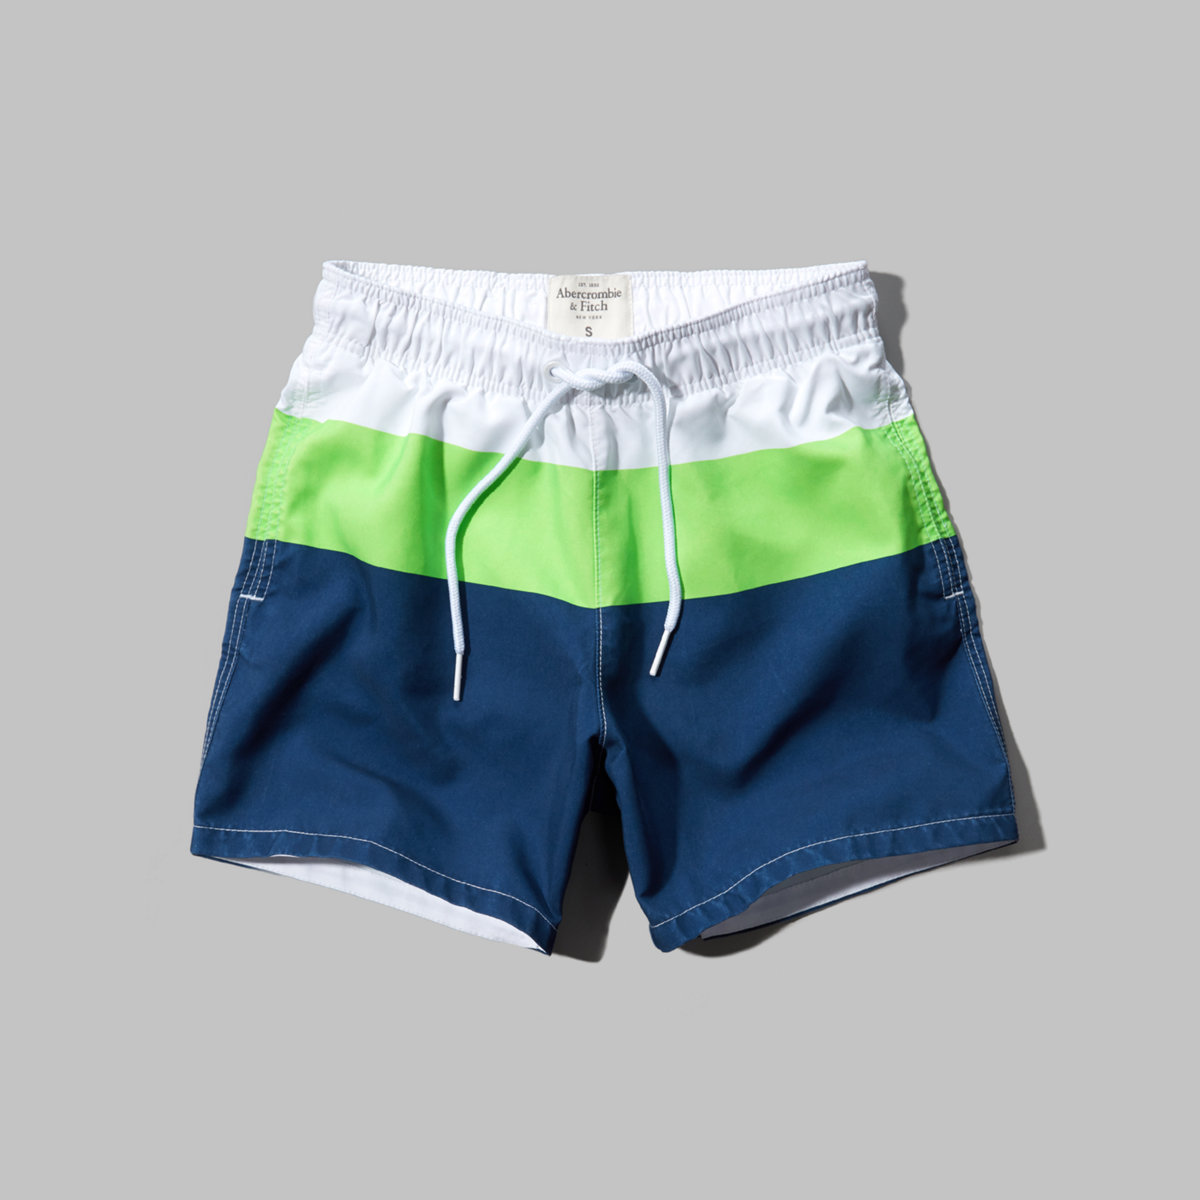 A&F Campus Fit Swim Shorts